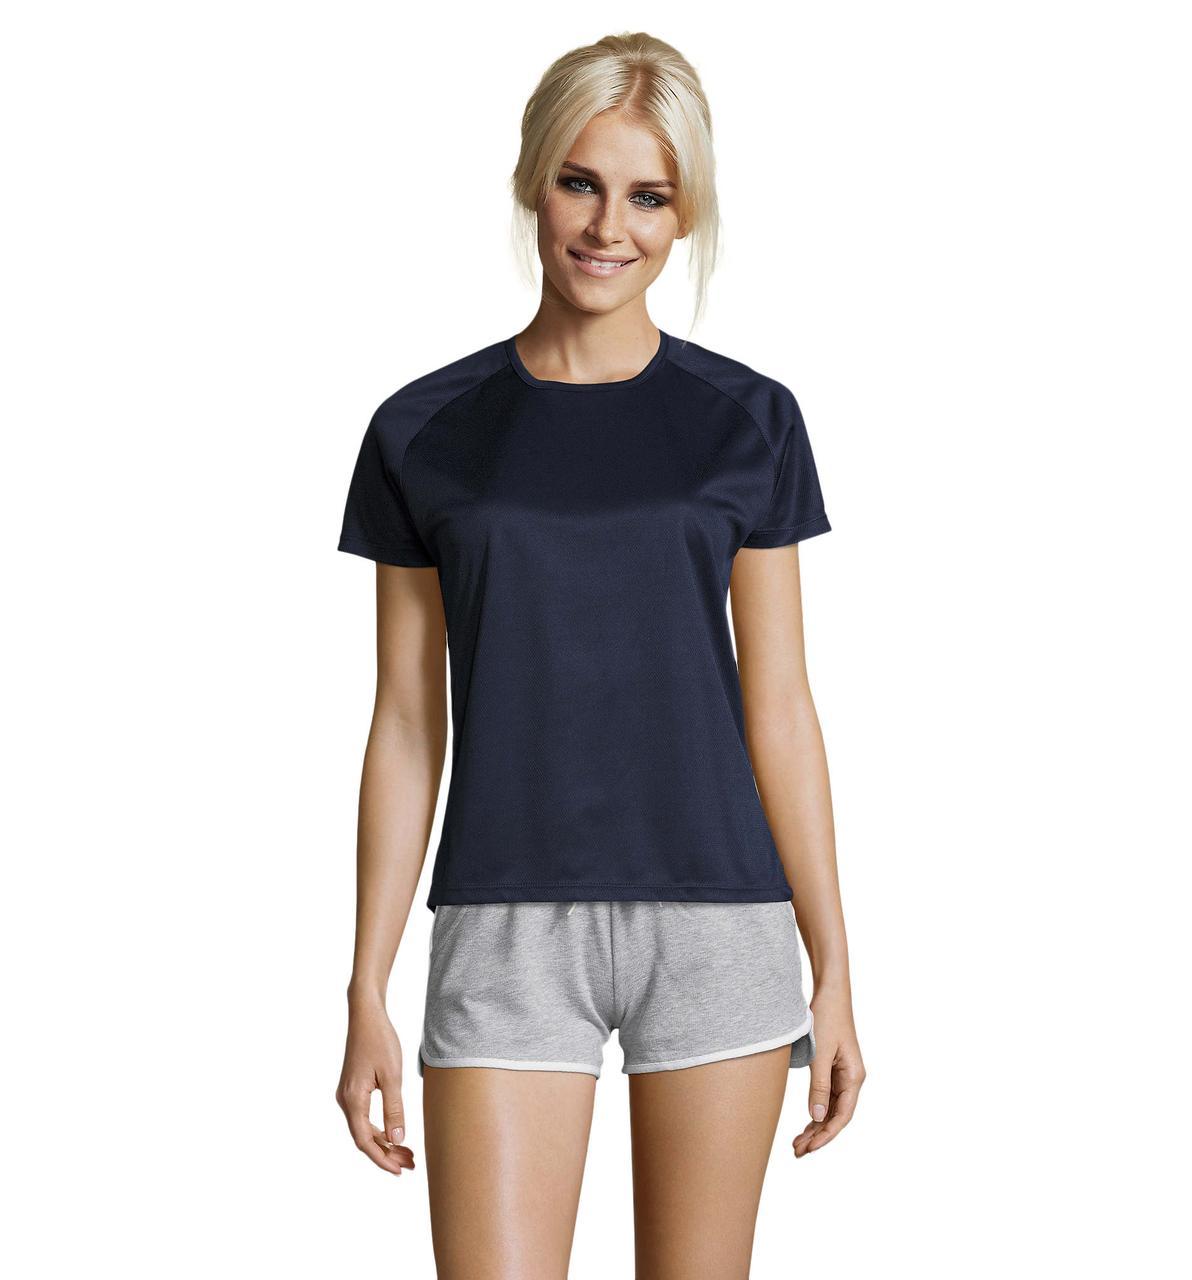 Женская спортивная футболка, т.синий, SOL'S SPORTY WOMEN от XS до XXL